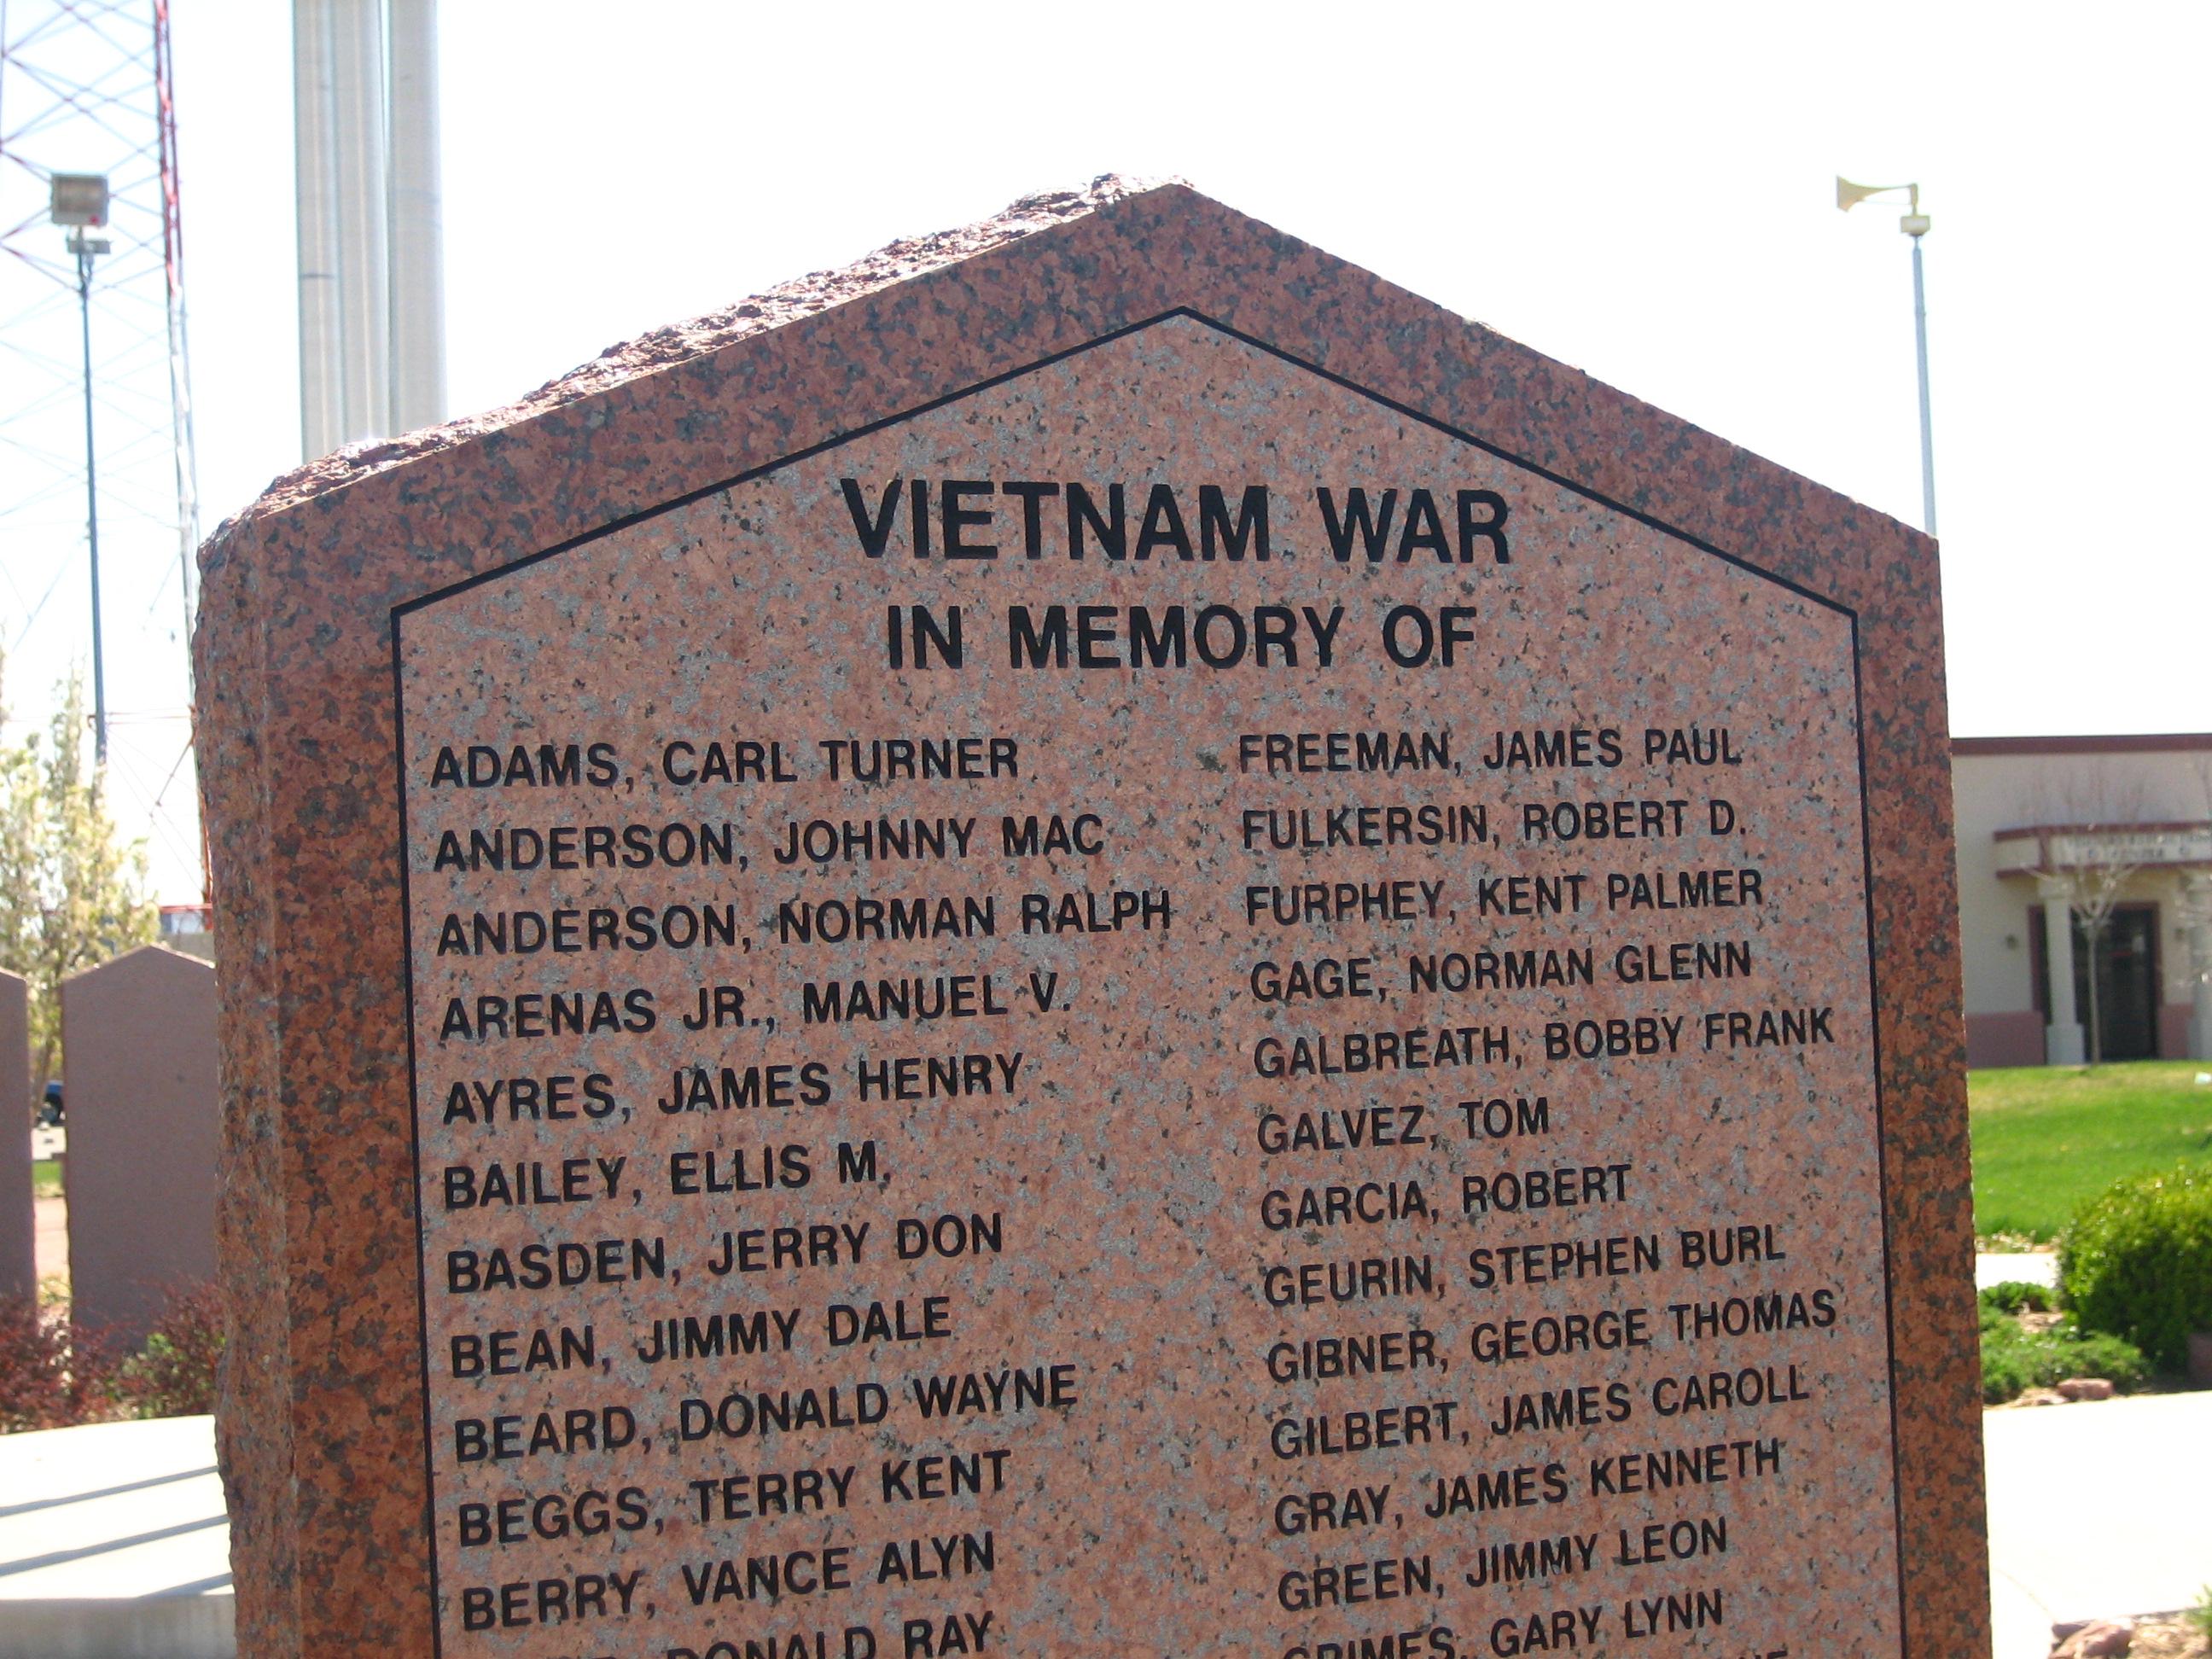 Vietnam War Memorial Washington File:vietnam War Memorial in